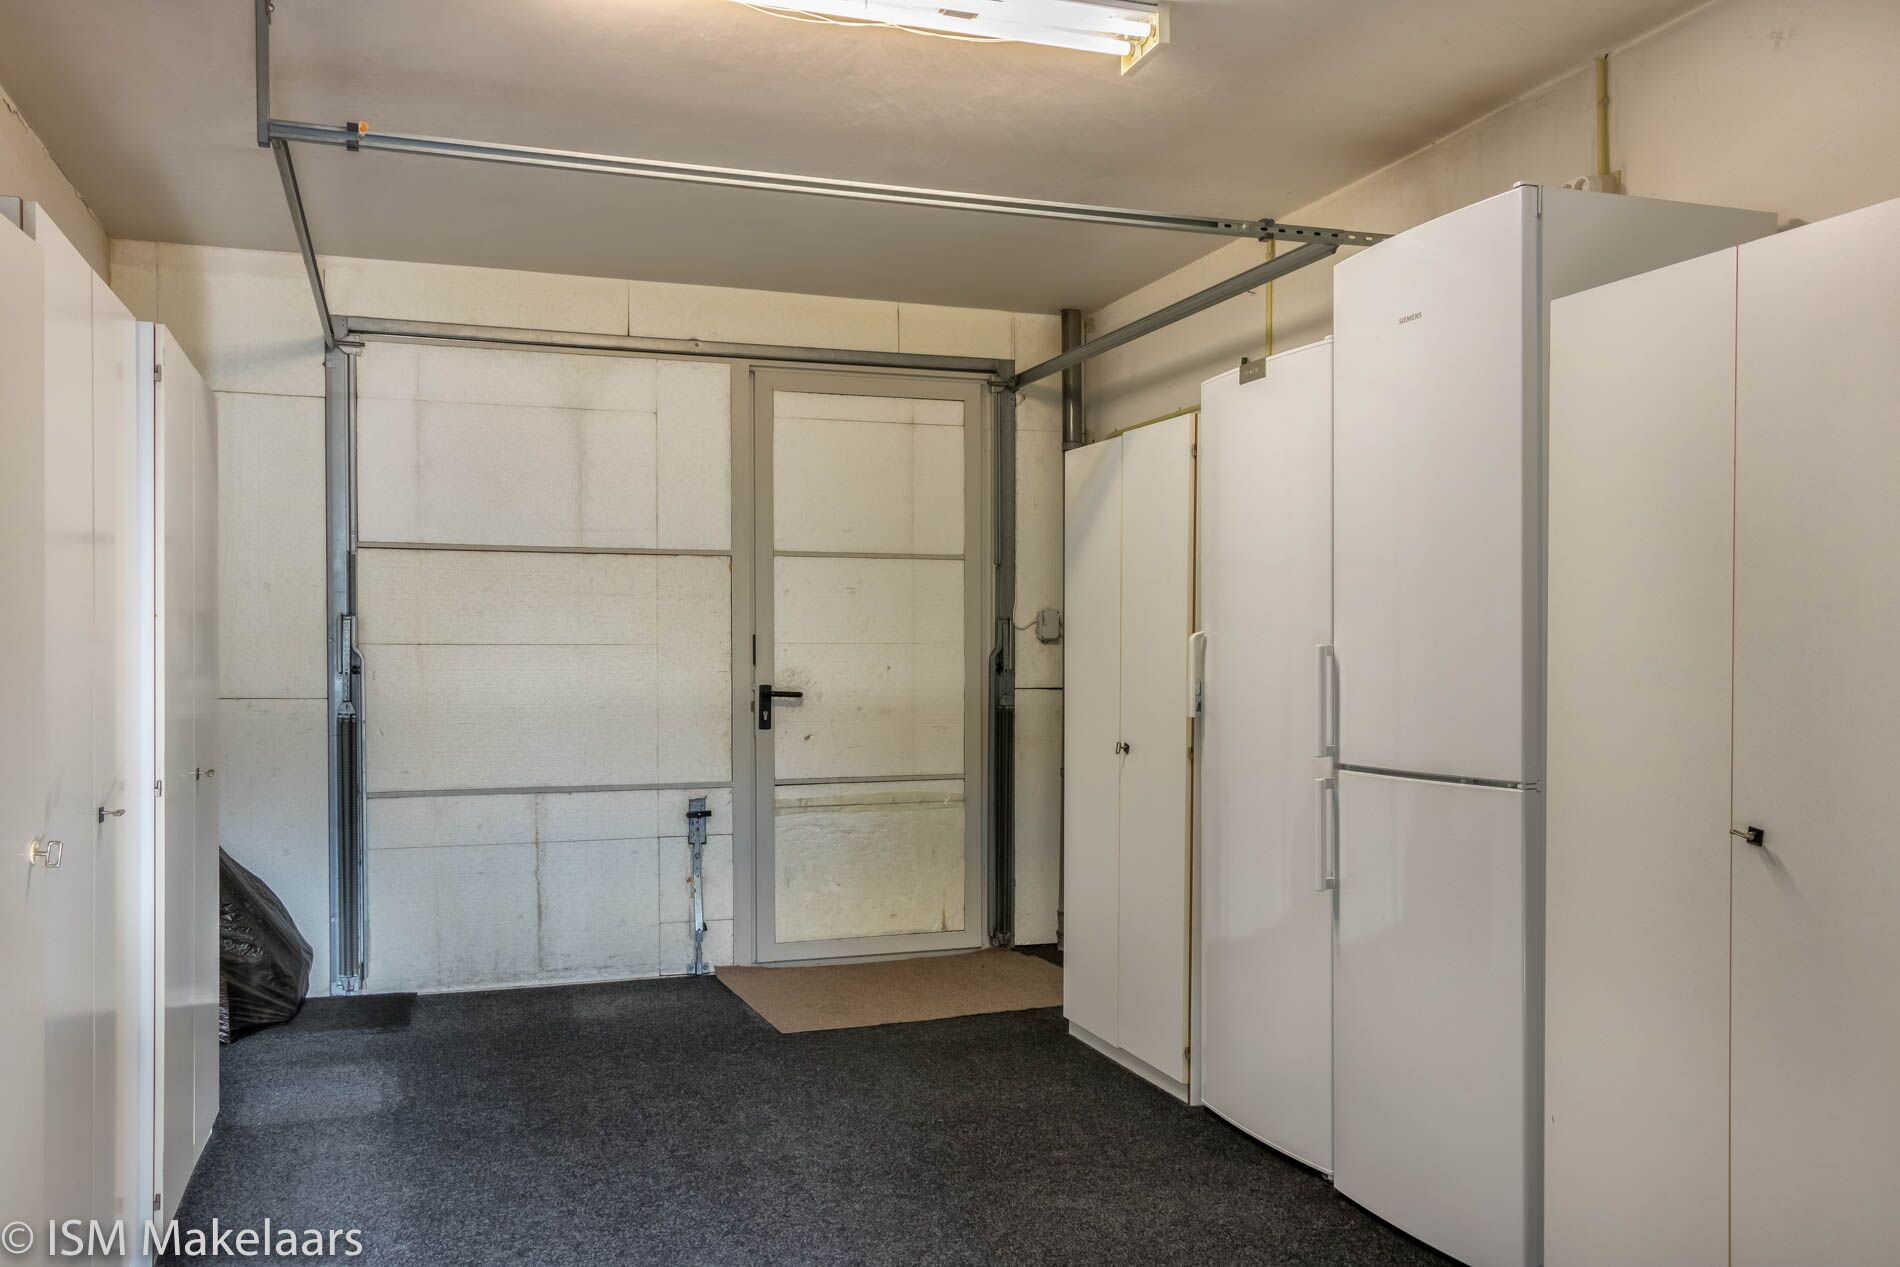 Garage lansenpad 7 vlissingen ISM makelaars